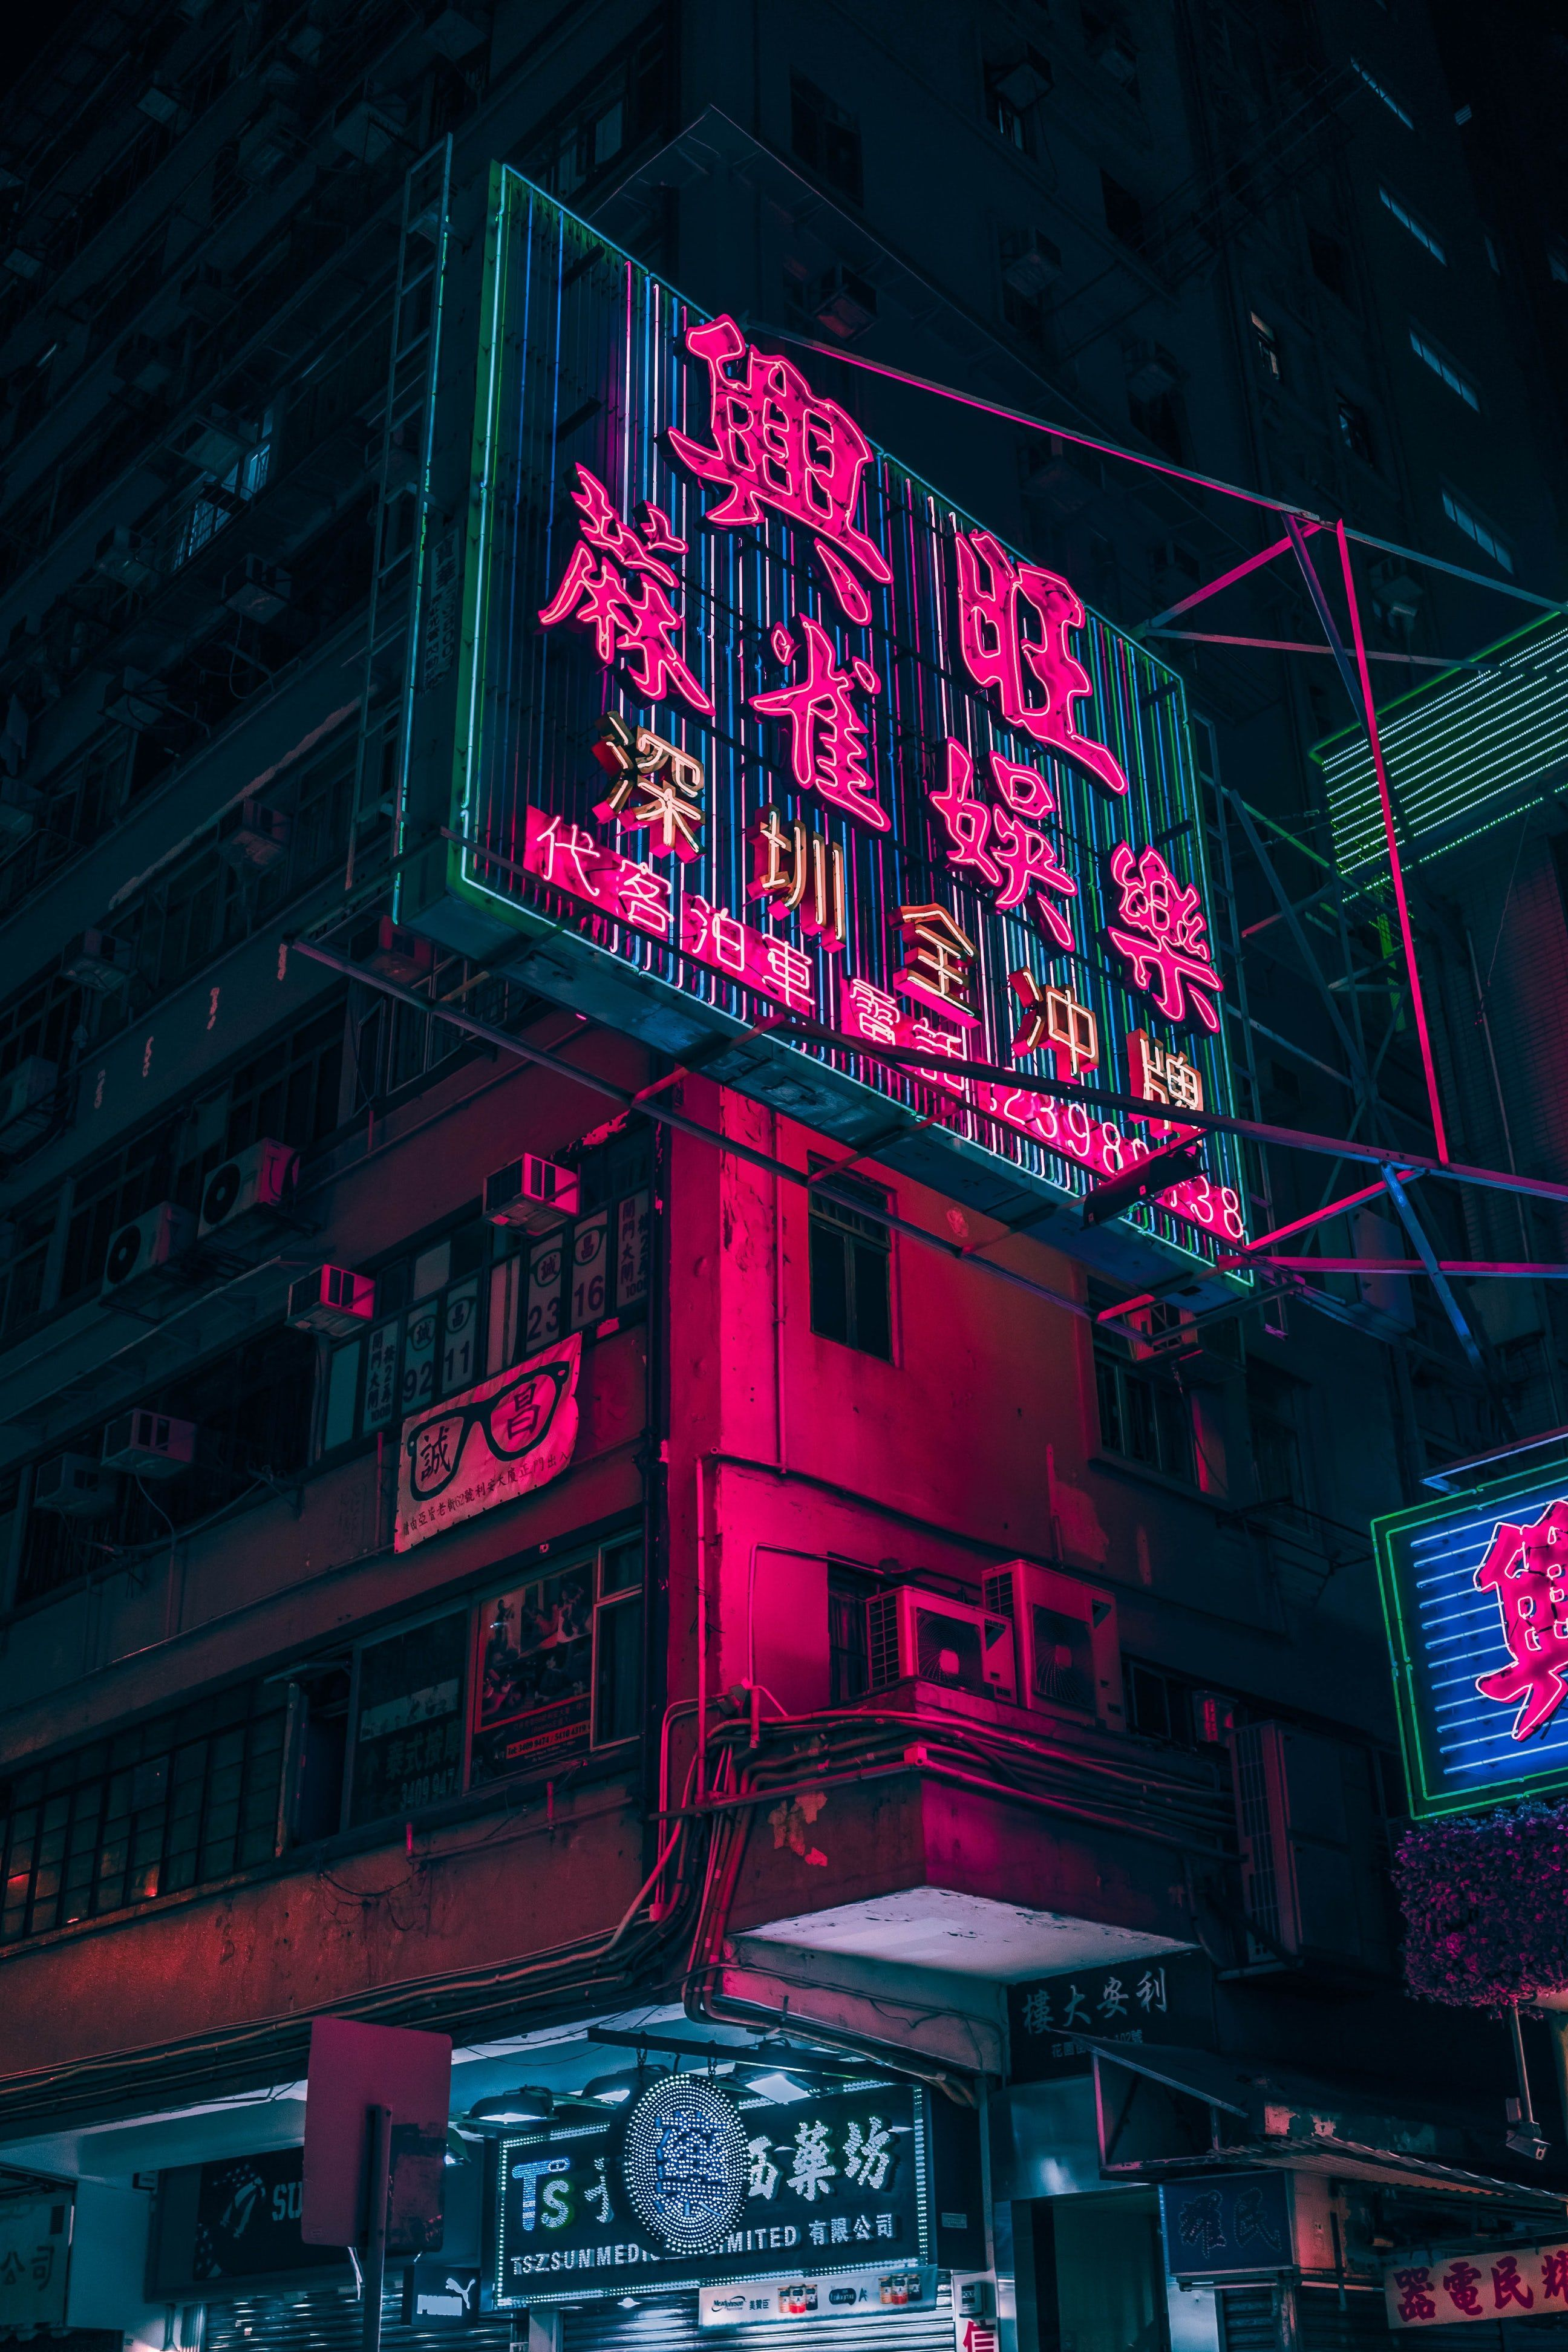 Aesthetic Phone Wallpapers Hd Pesquisa Google Neon Cyberpunk Seni Jepang